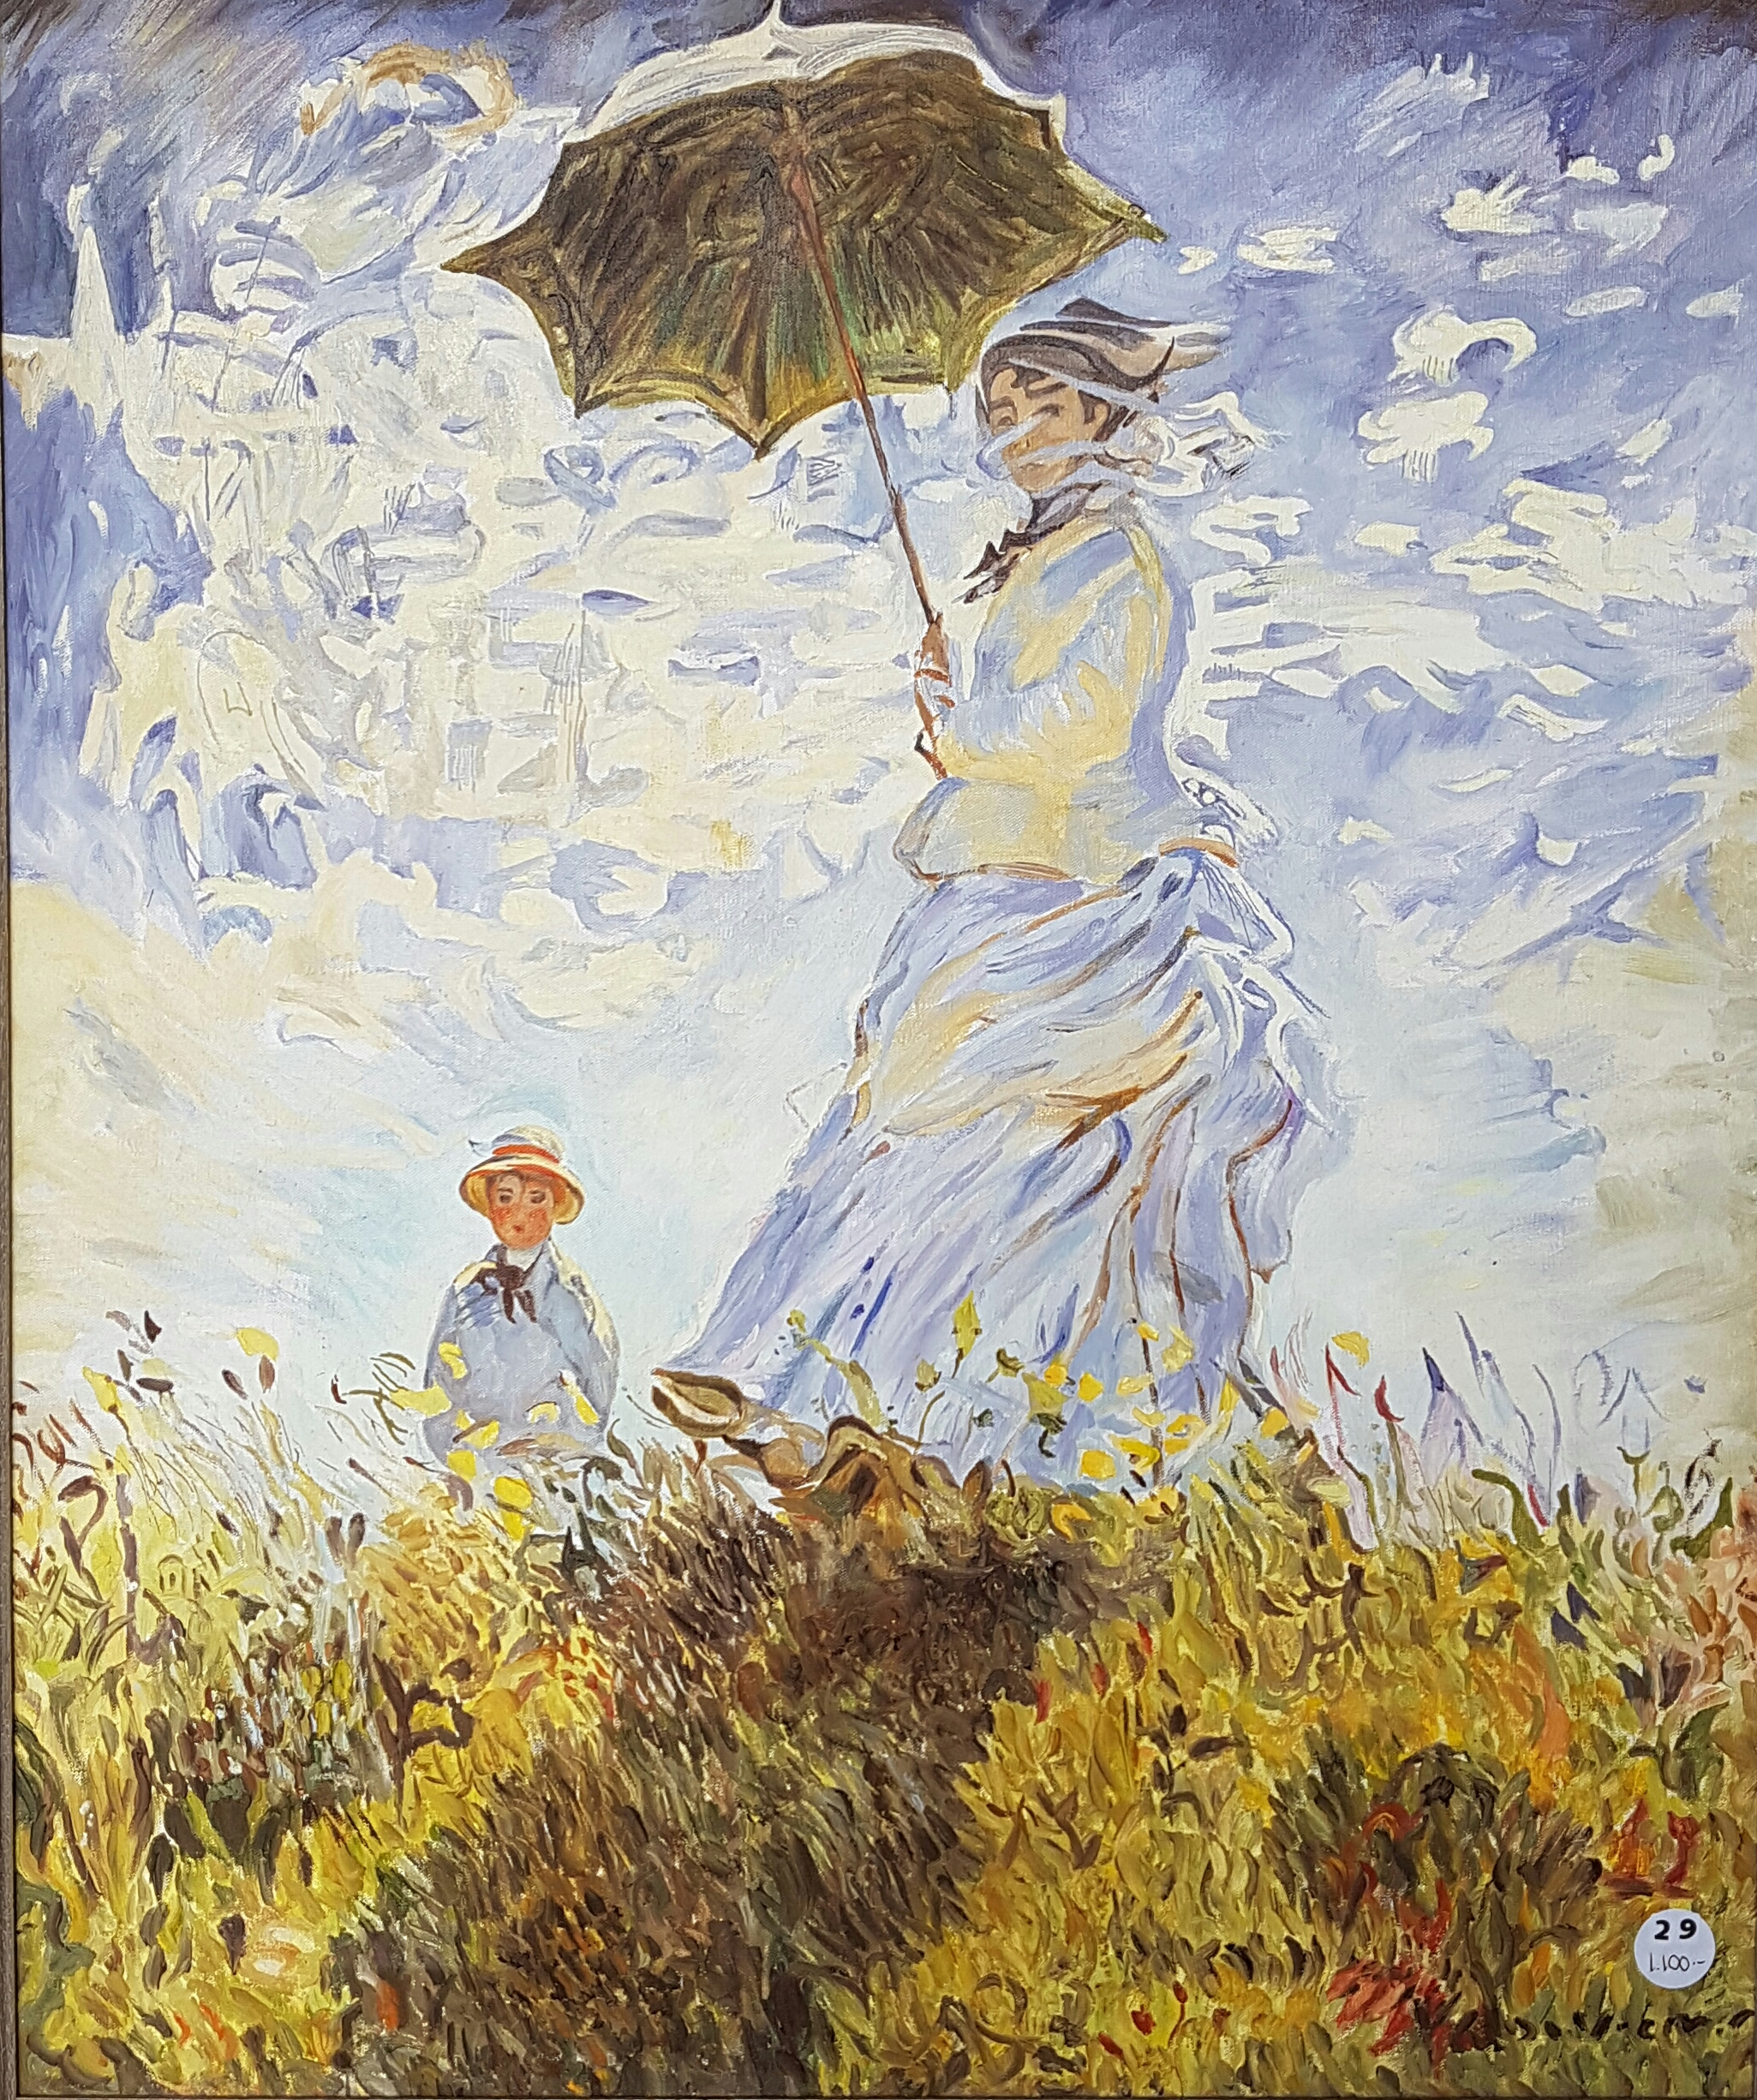 Nadia Forsell d'apres Monet - Femme a l'ombrelle.jpg